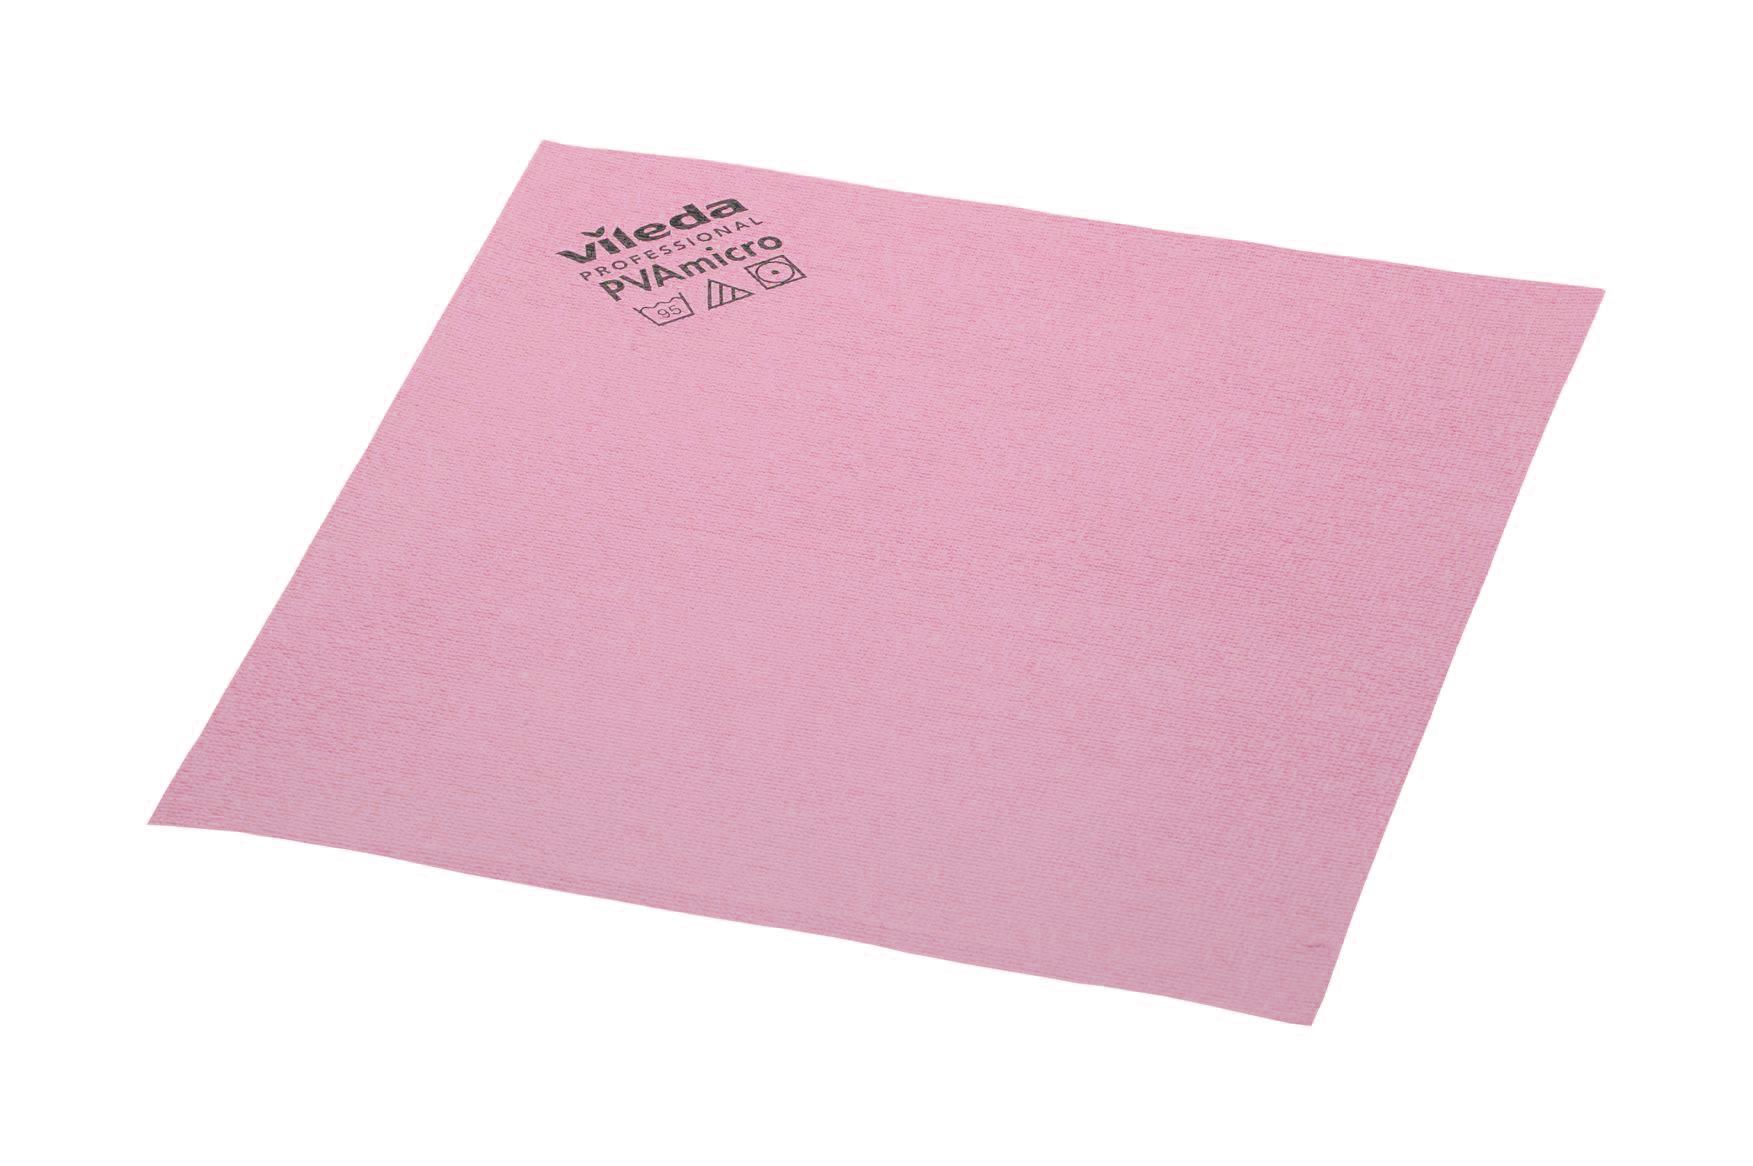 Vileda PVA Micro, 5 Stück/Packung, rot, 38 x 35 cm